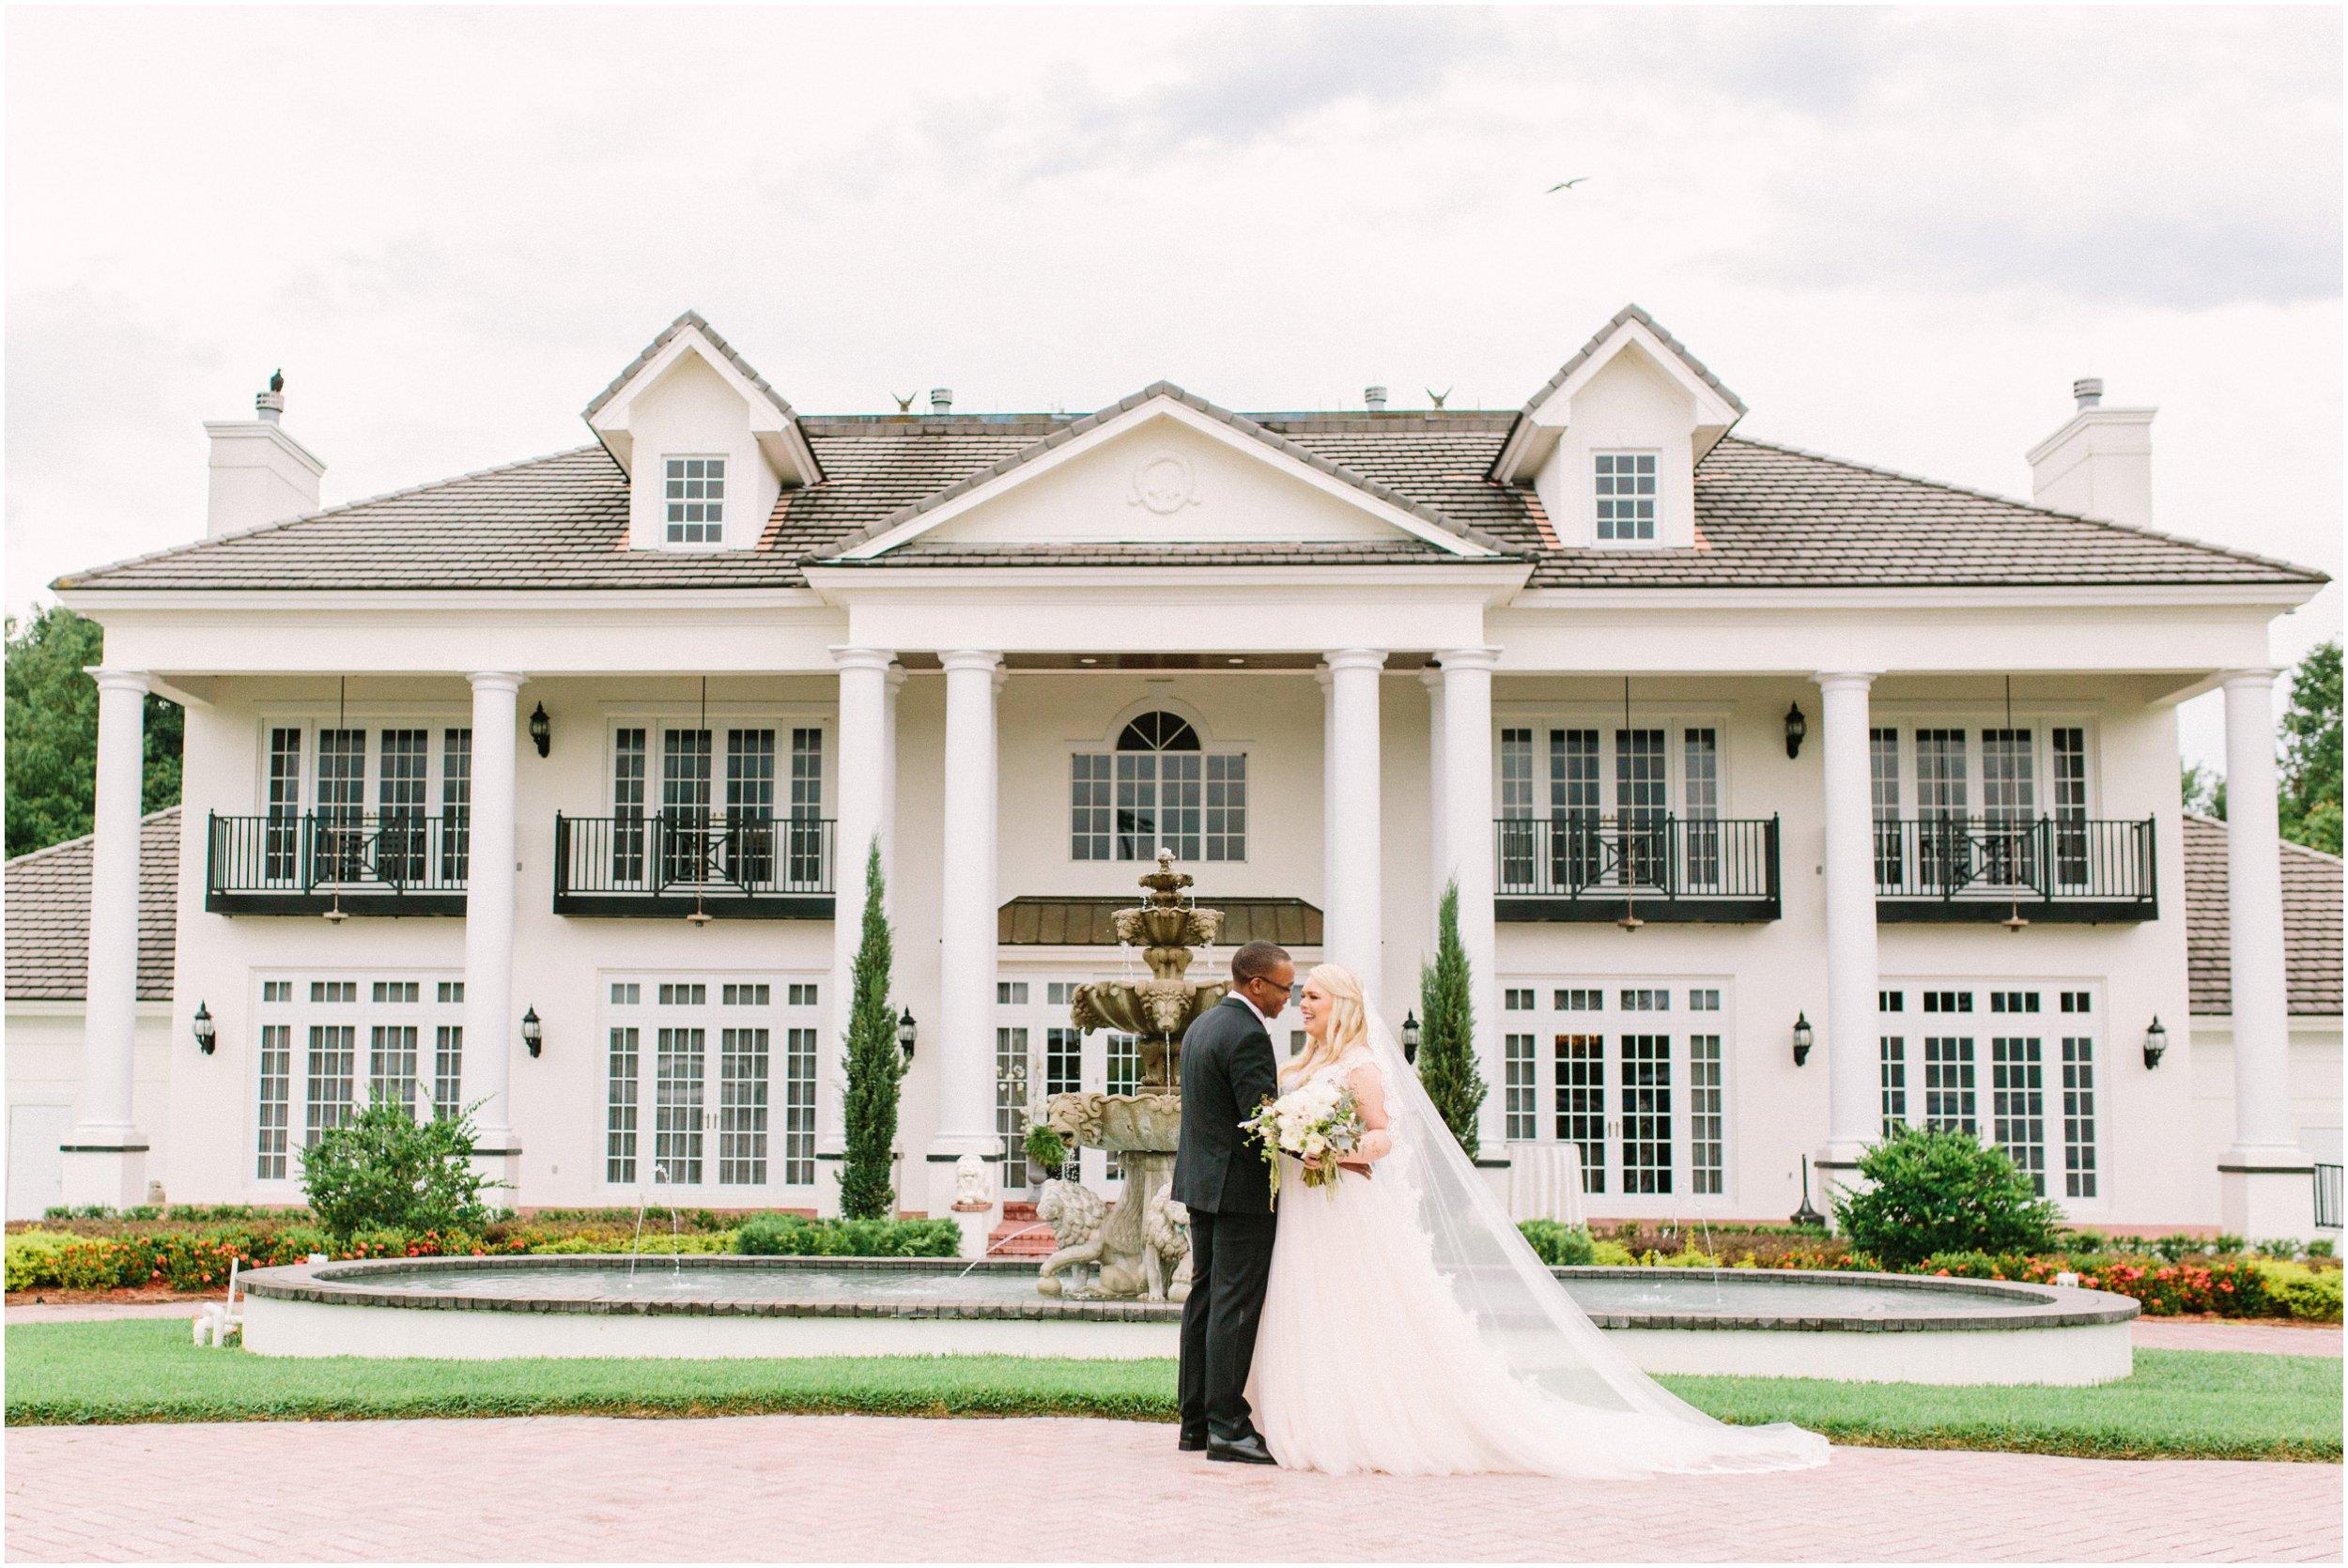 luxmore-grande-estate-orlando-wedding-photographer_0035.jpg